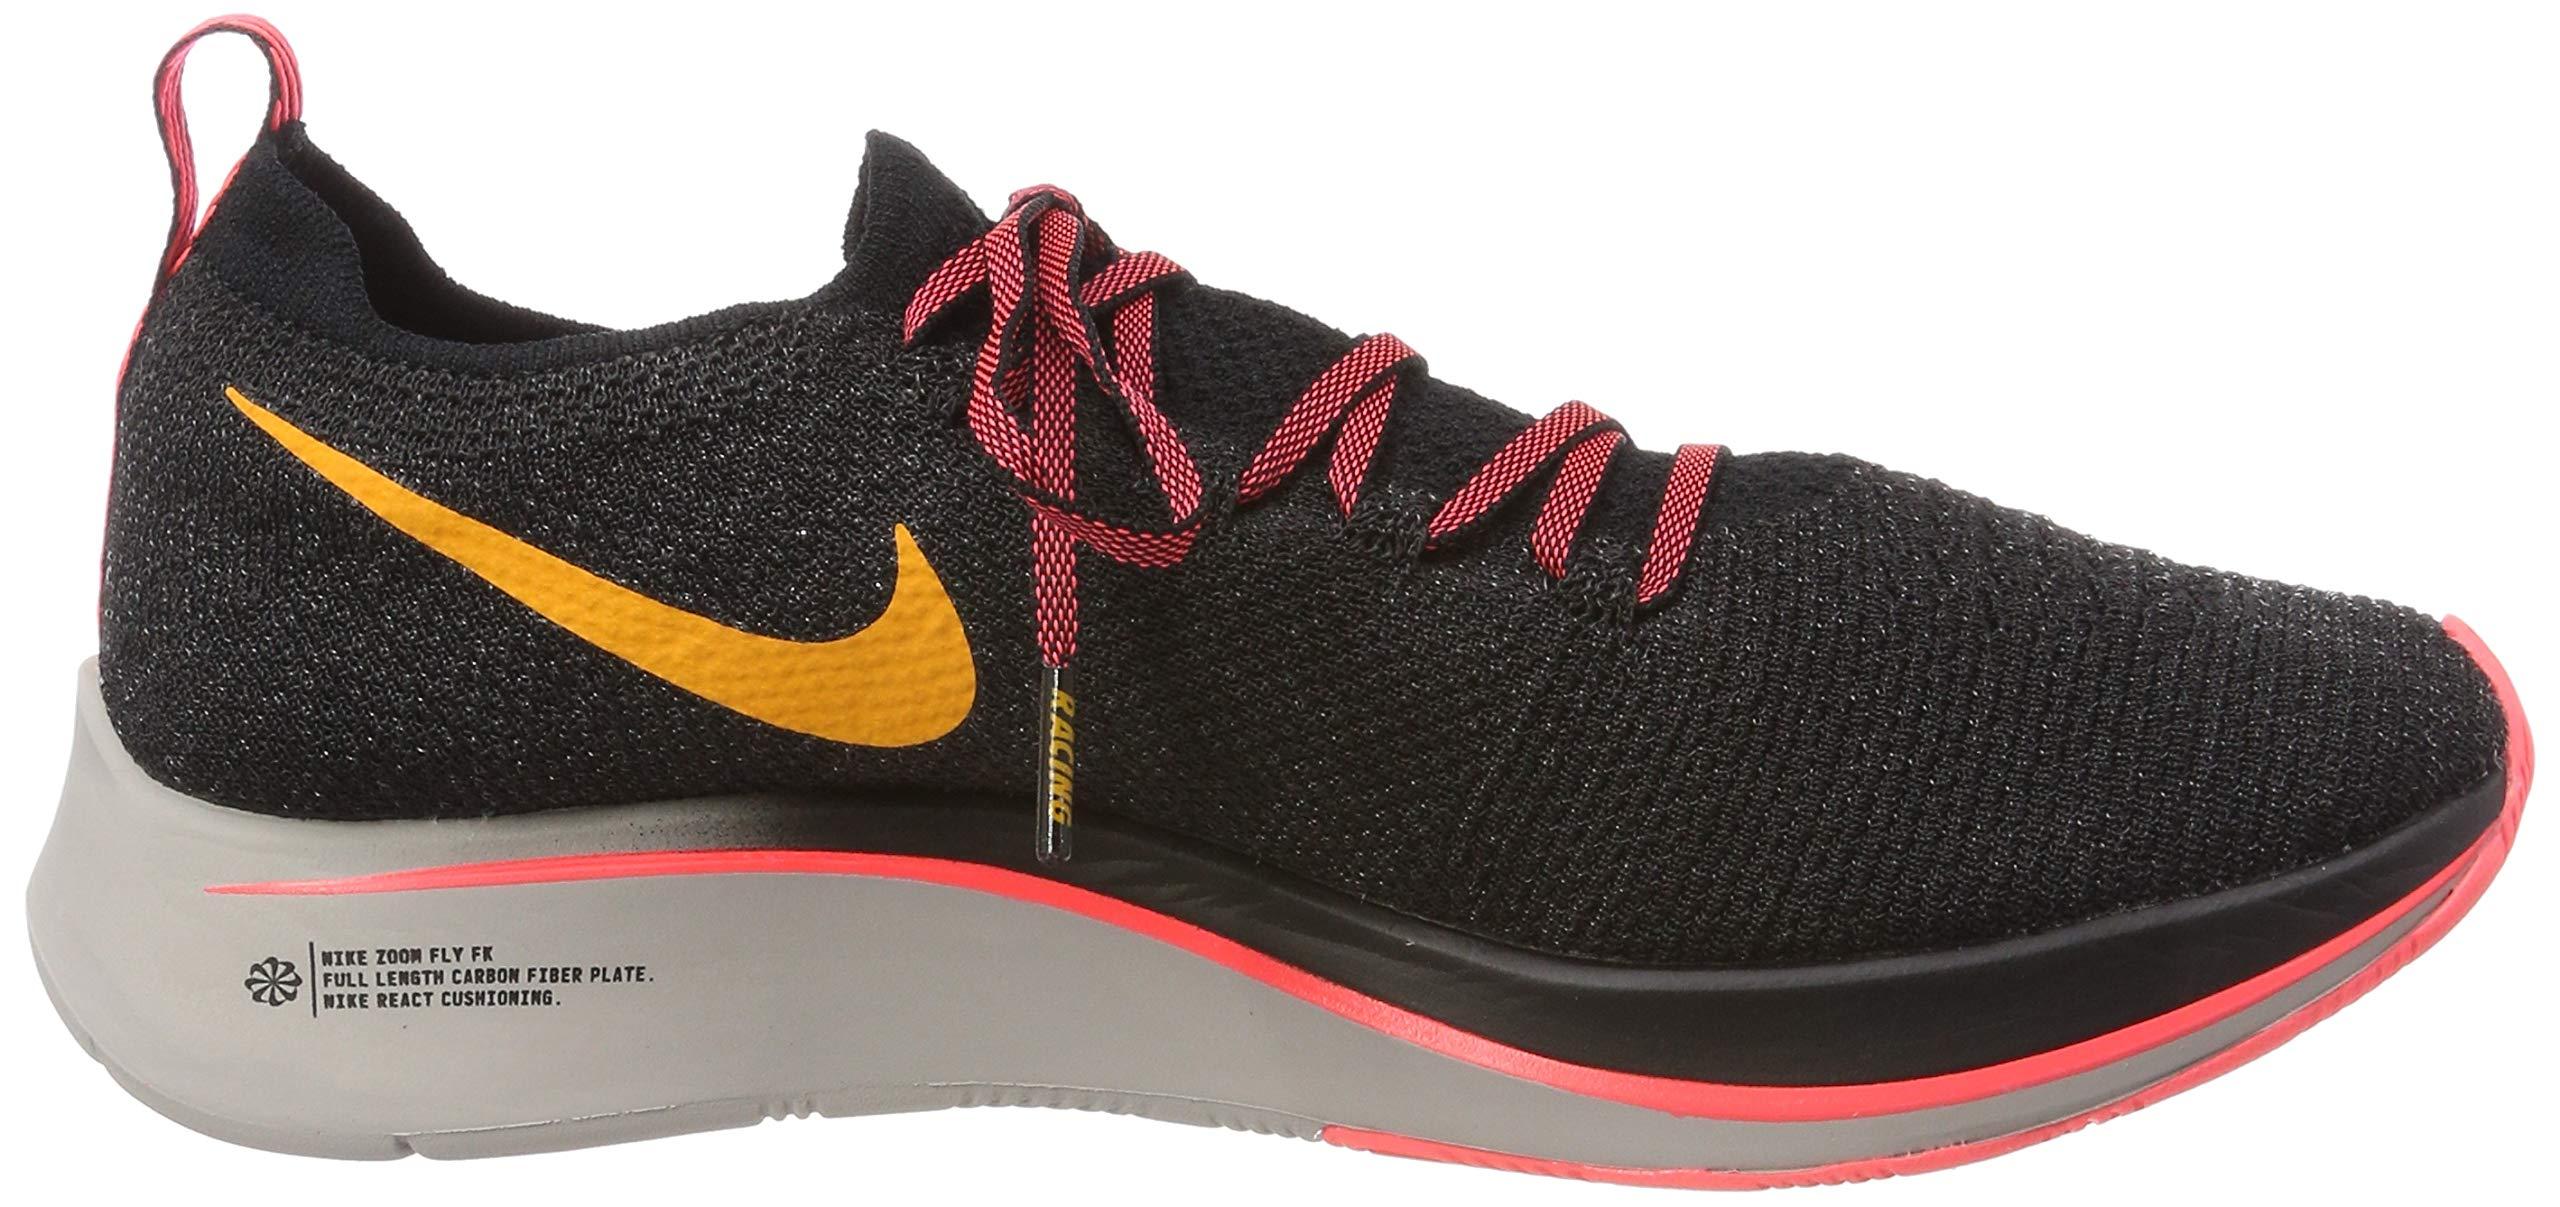 Nike Zoom Fly Flyknit Men's Running Shoe Black/Orange Peel-Flash Crimson Size 8 M US by Nike (Image #6)